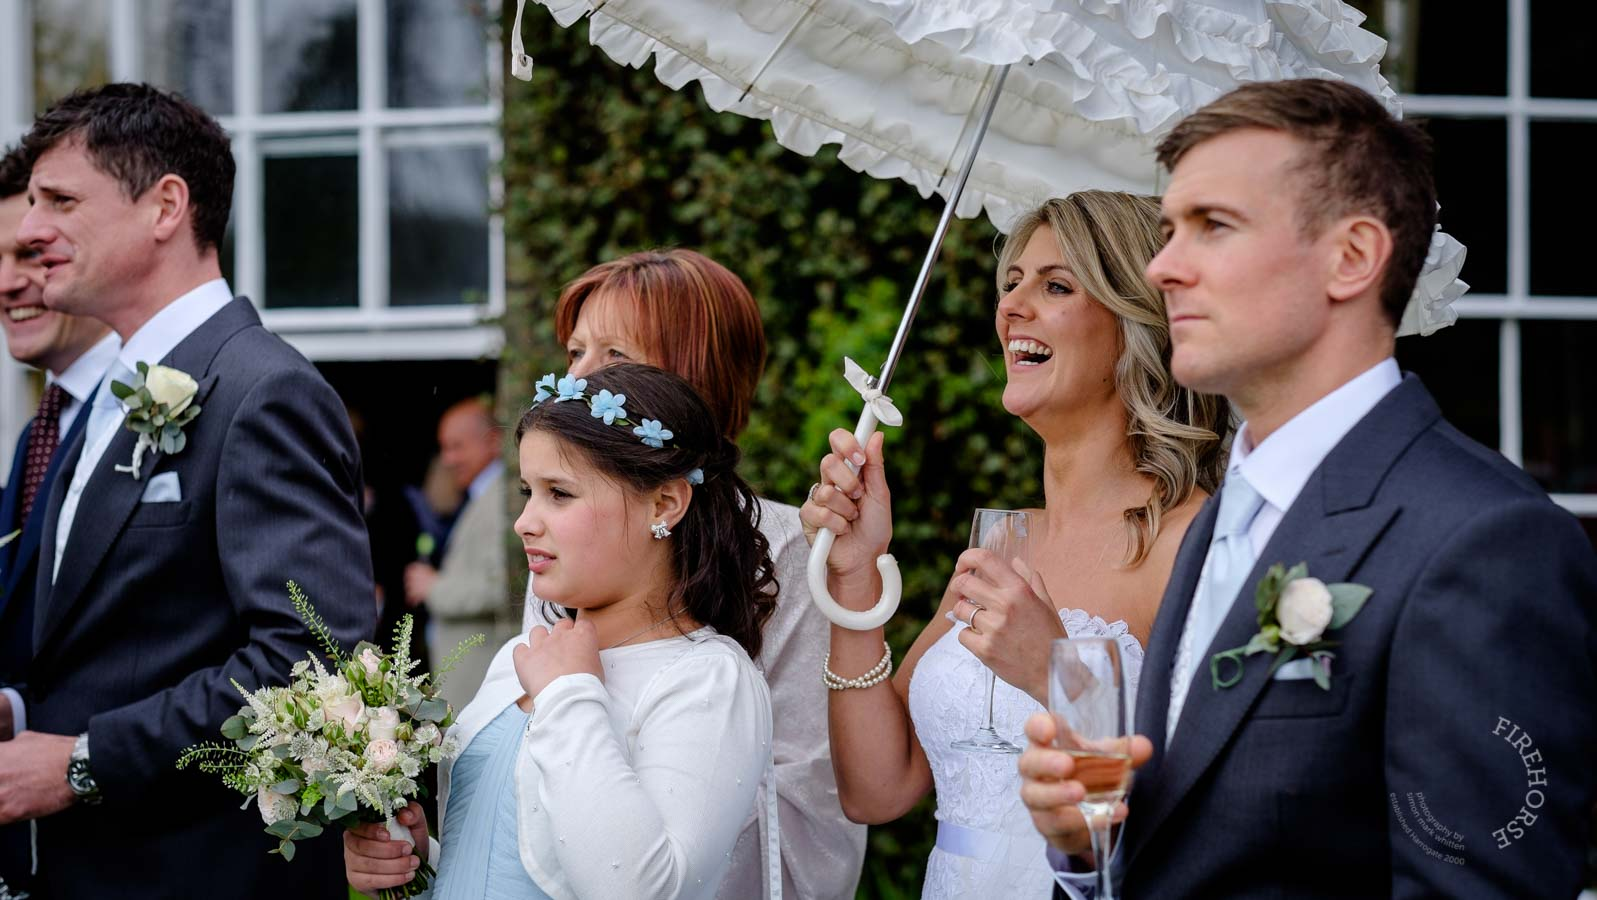 Swinton-Park-Spring-Wedding-233